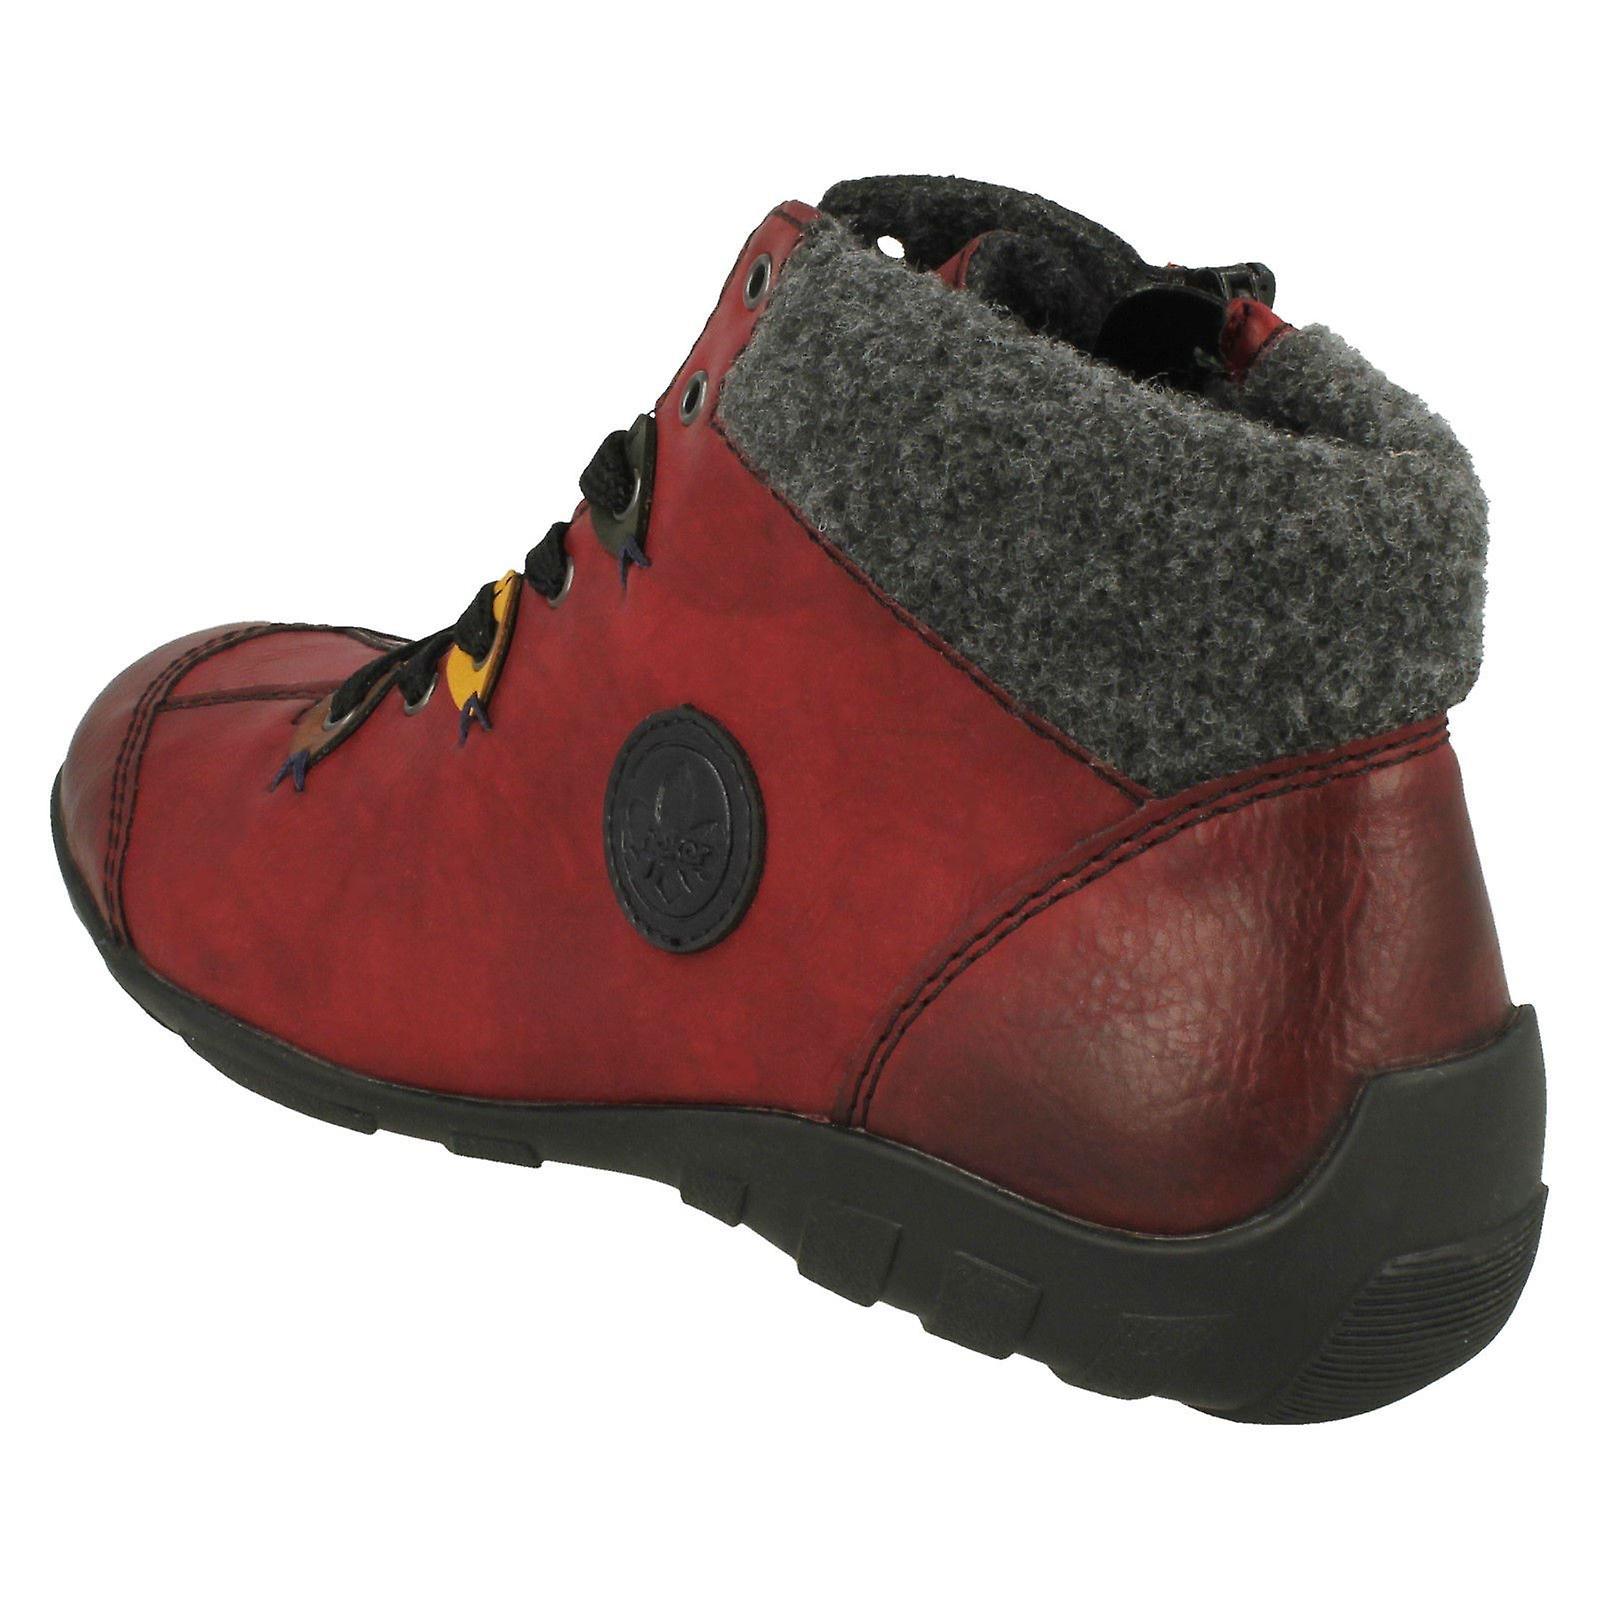 Ladies Rieker Casual Ankel Boots L6513